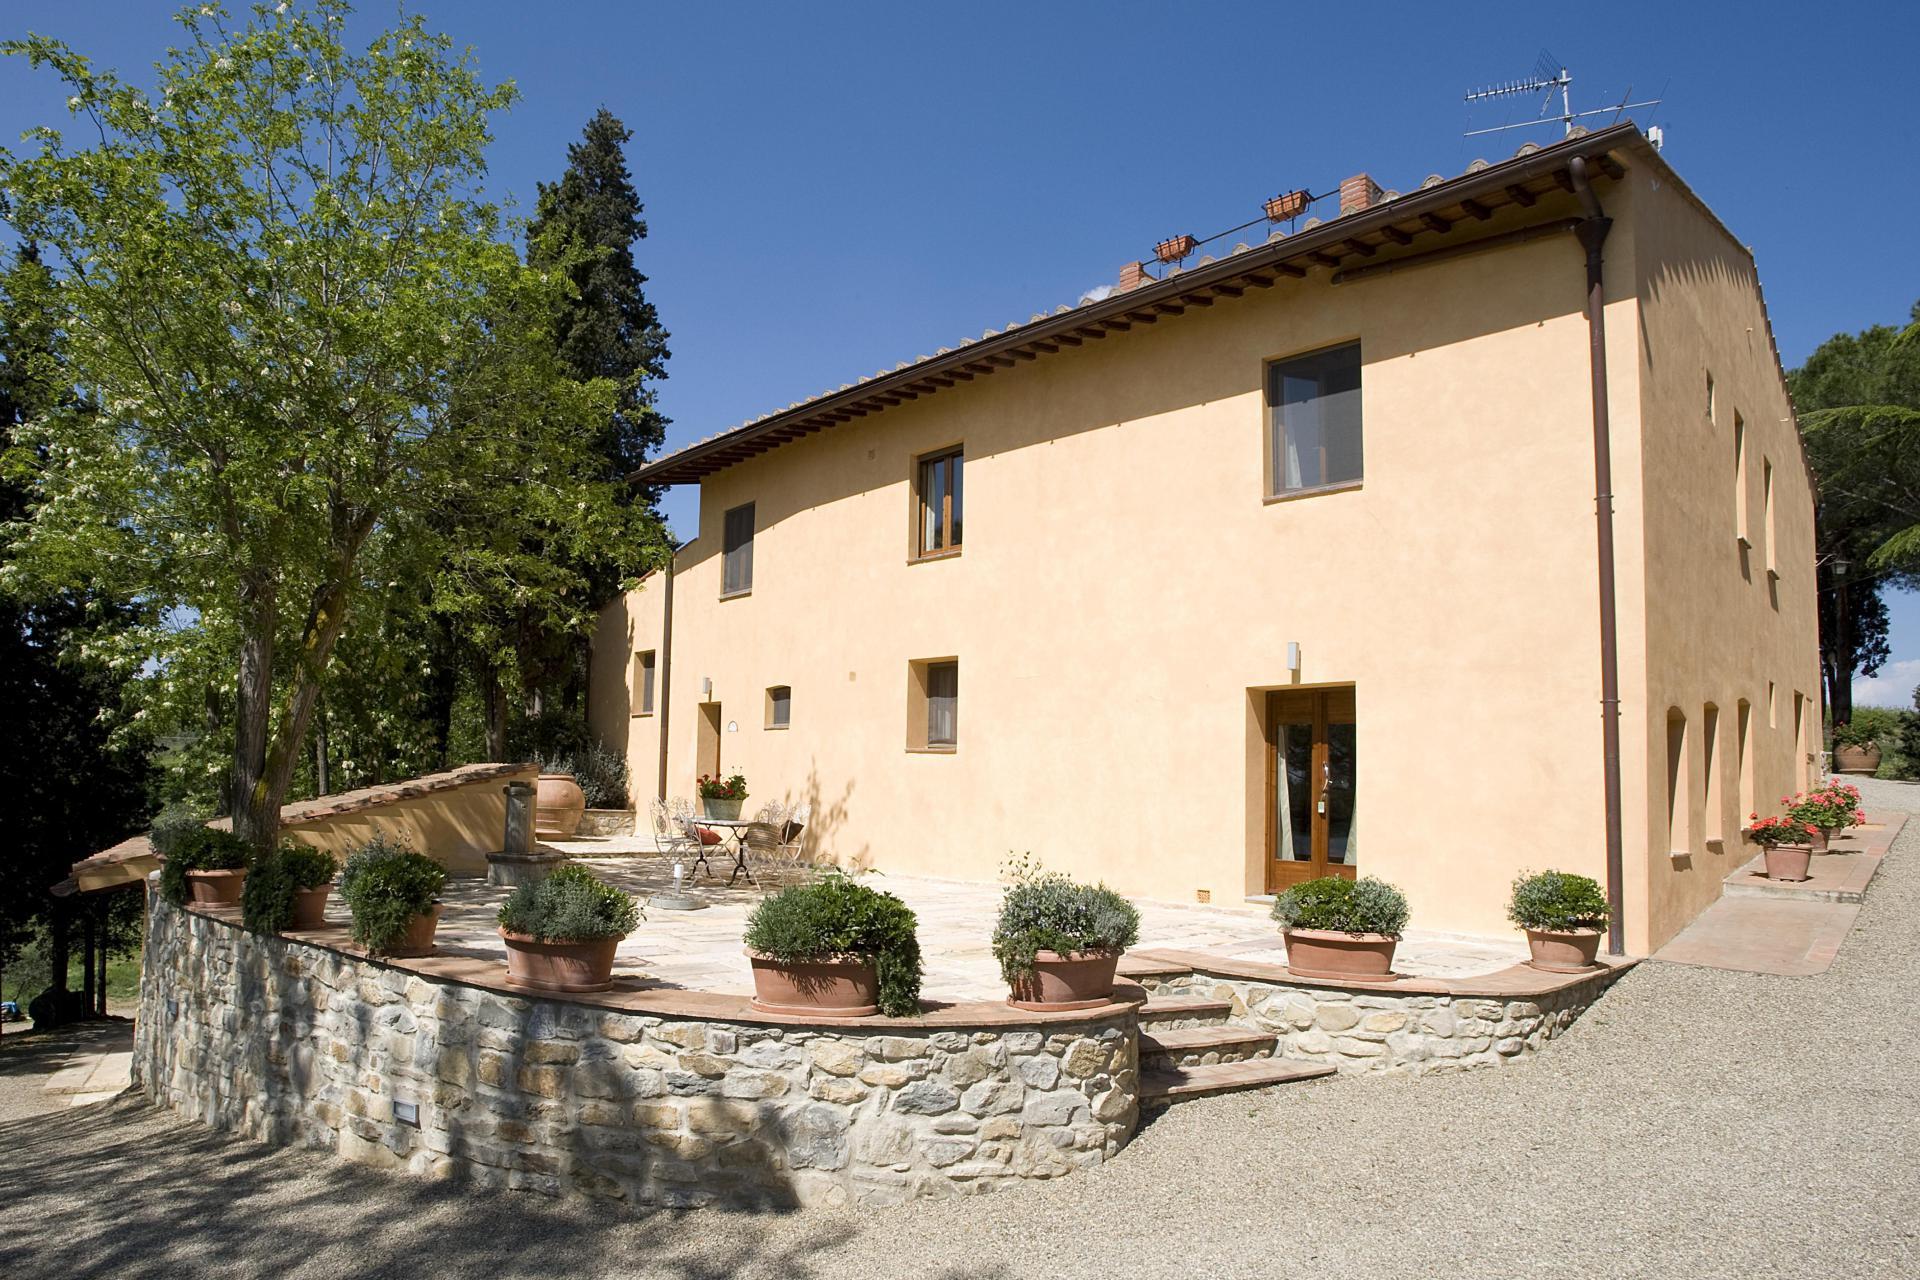 Agriturismo Toscane Luxe agriturismo bij San Gimignano in Toscane